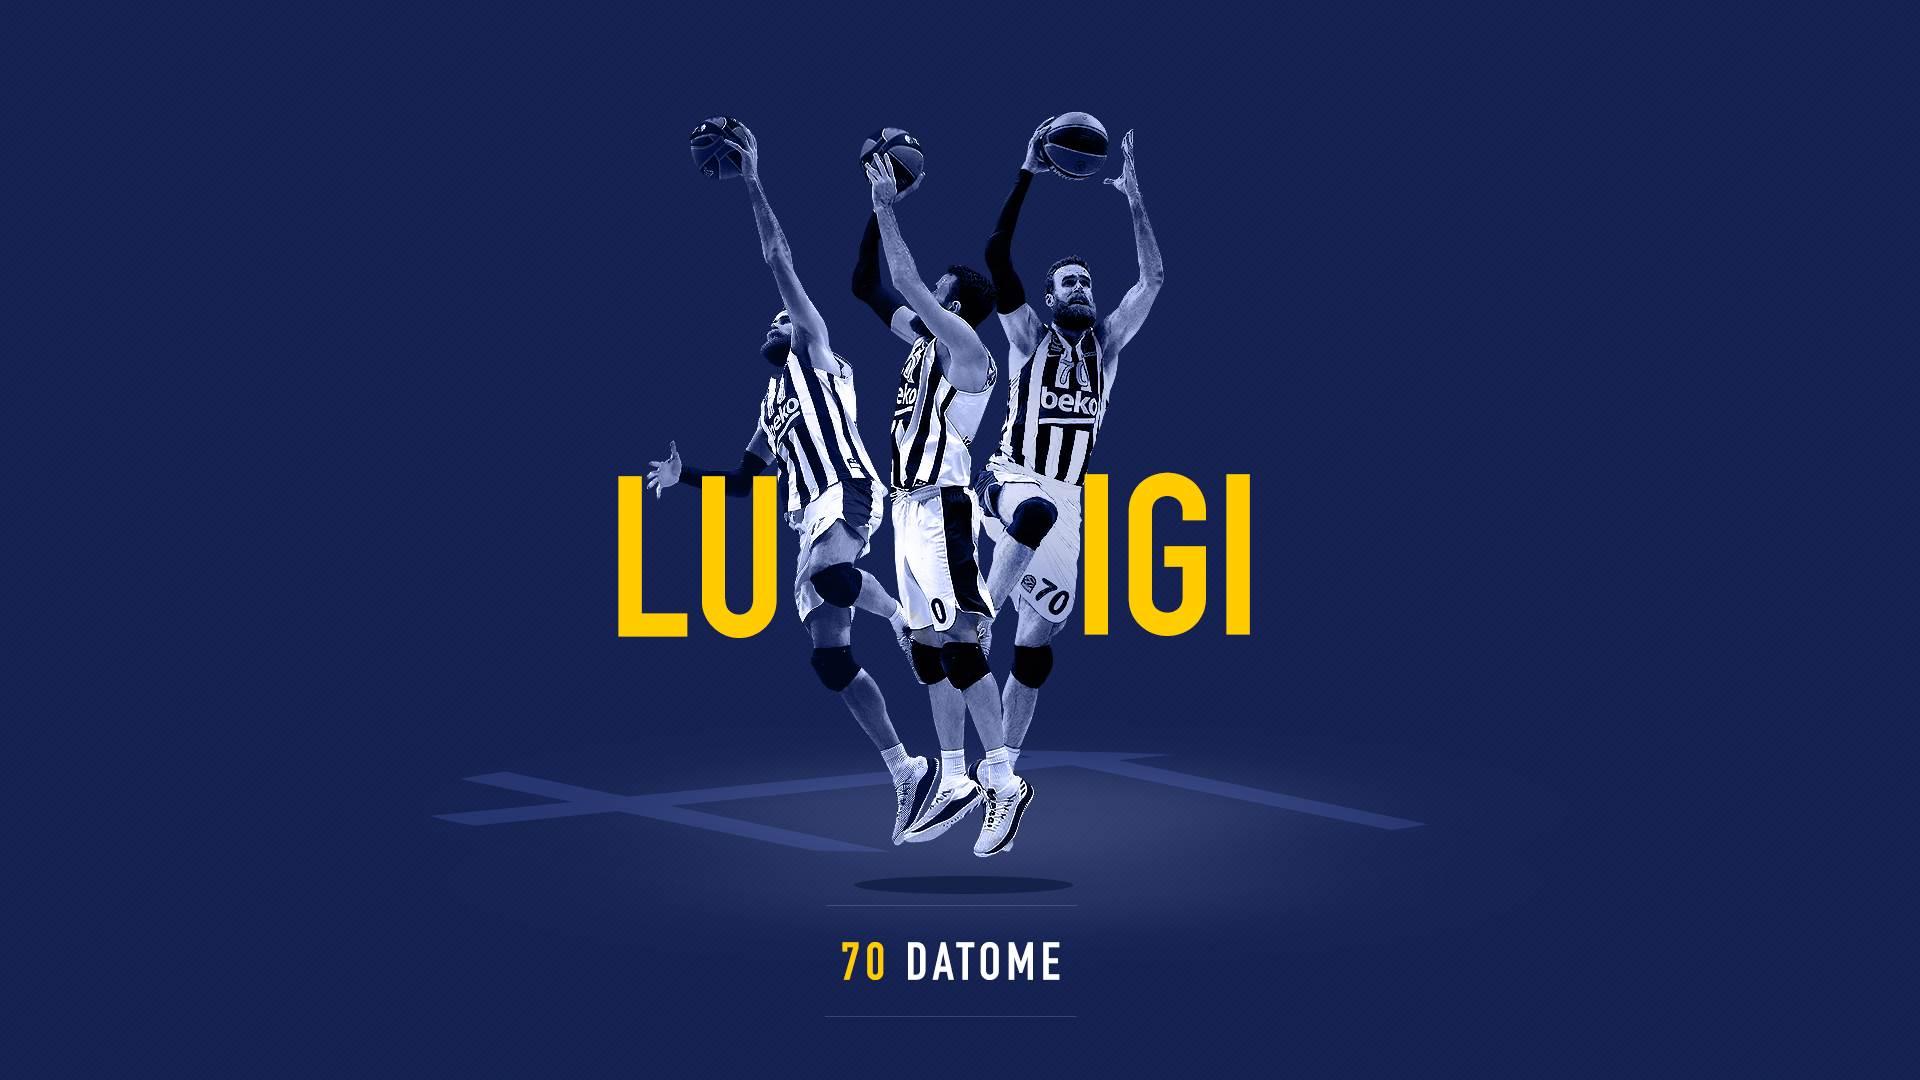 Luigi Datome